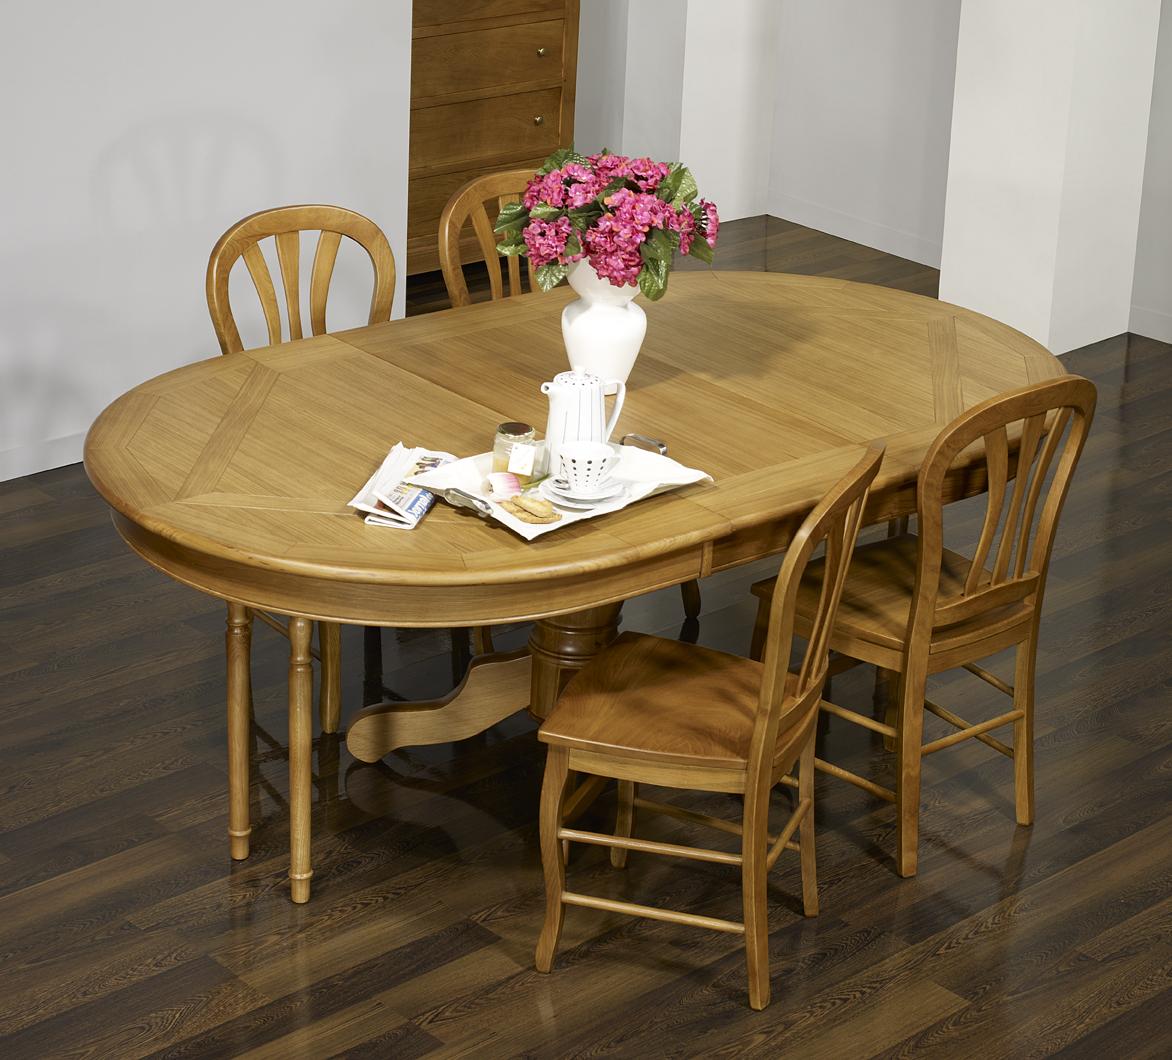 table ovale pied central fred ric 160x120 en ch ne de style louis philippe plateau marquete. Black Bedroom Furniture Sets. Home Design Ideas